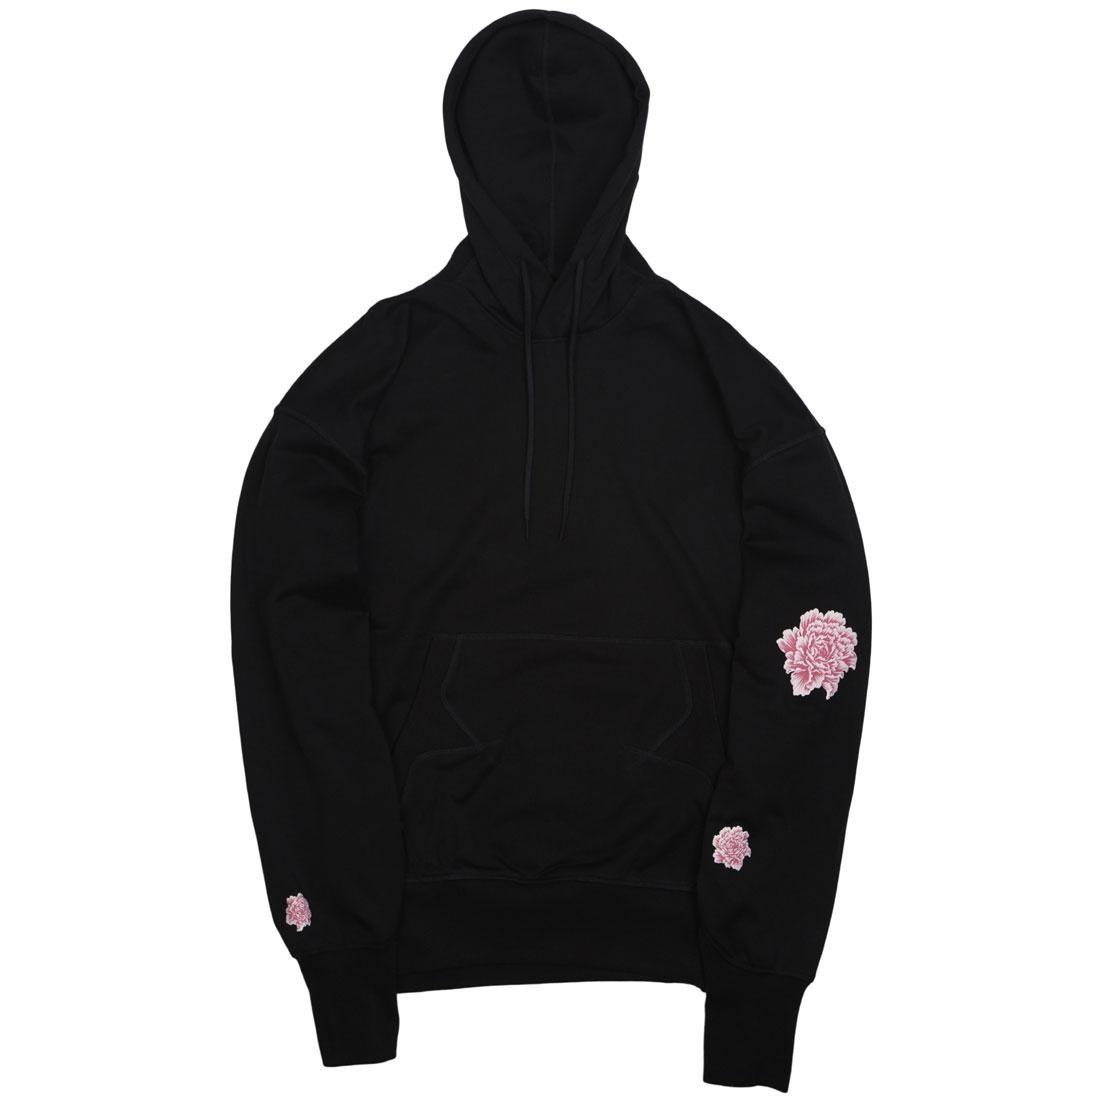 Adidas Y-3 x James Harden Men Hooded Sweater (black)